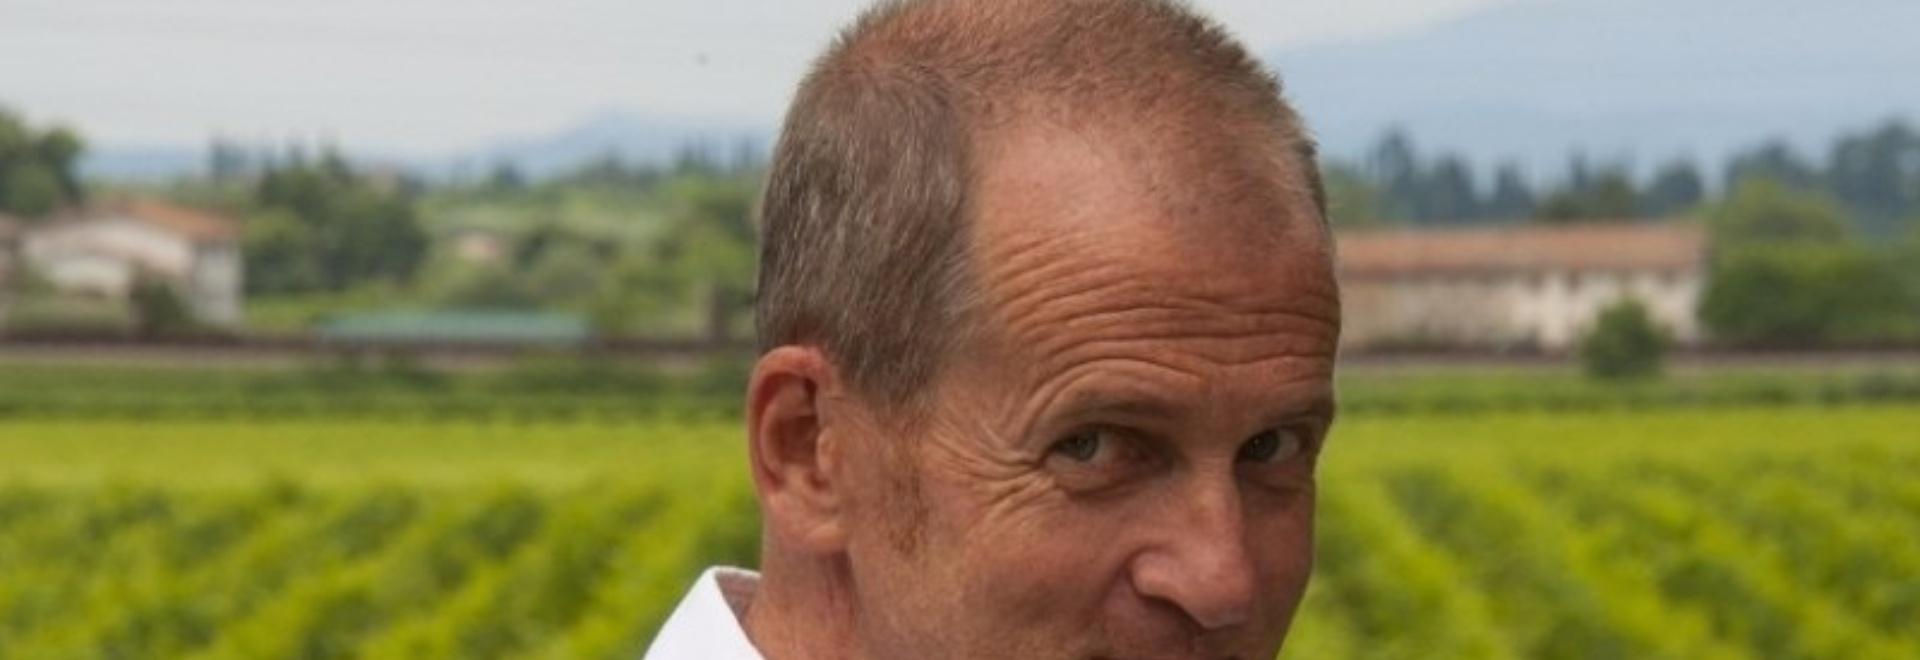 Haymo Gutweniger: anatra con radicchio